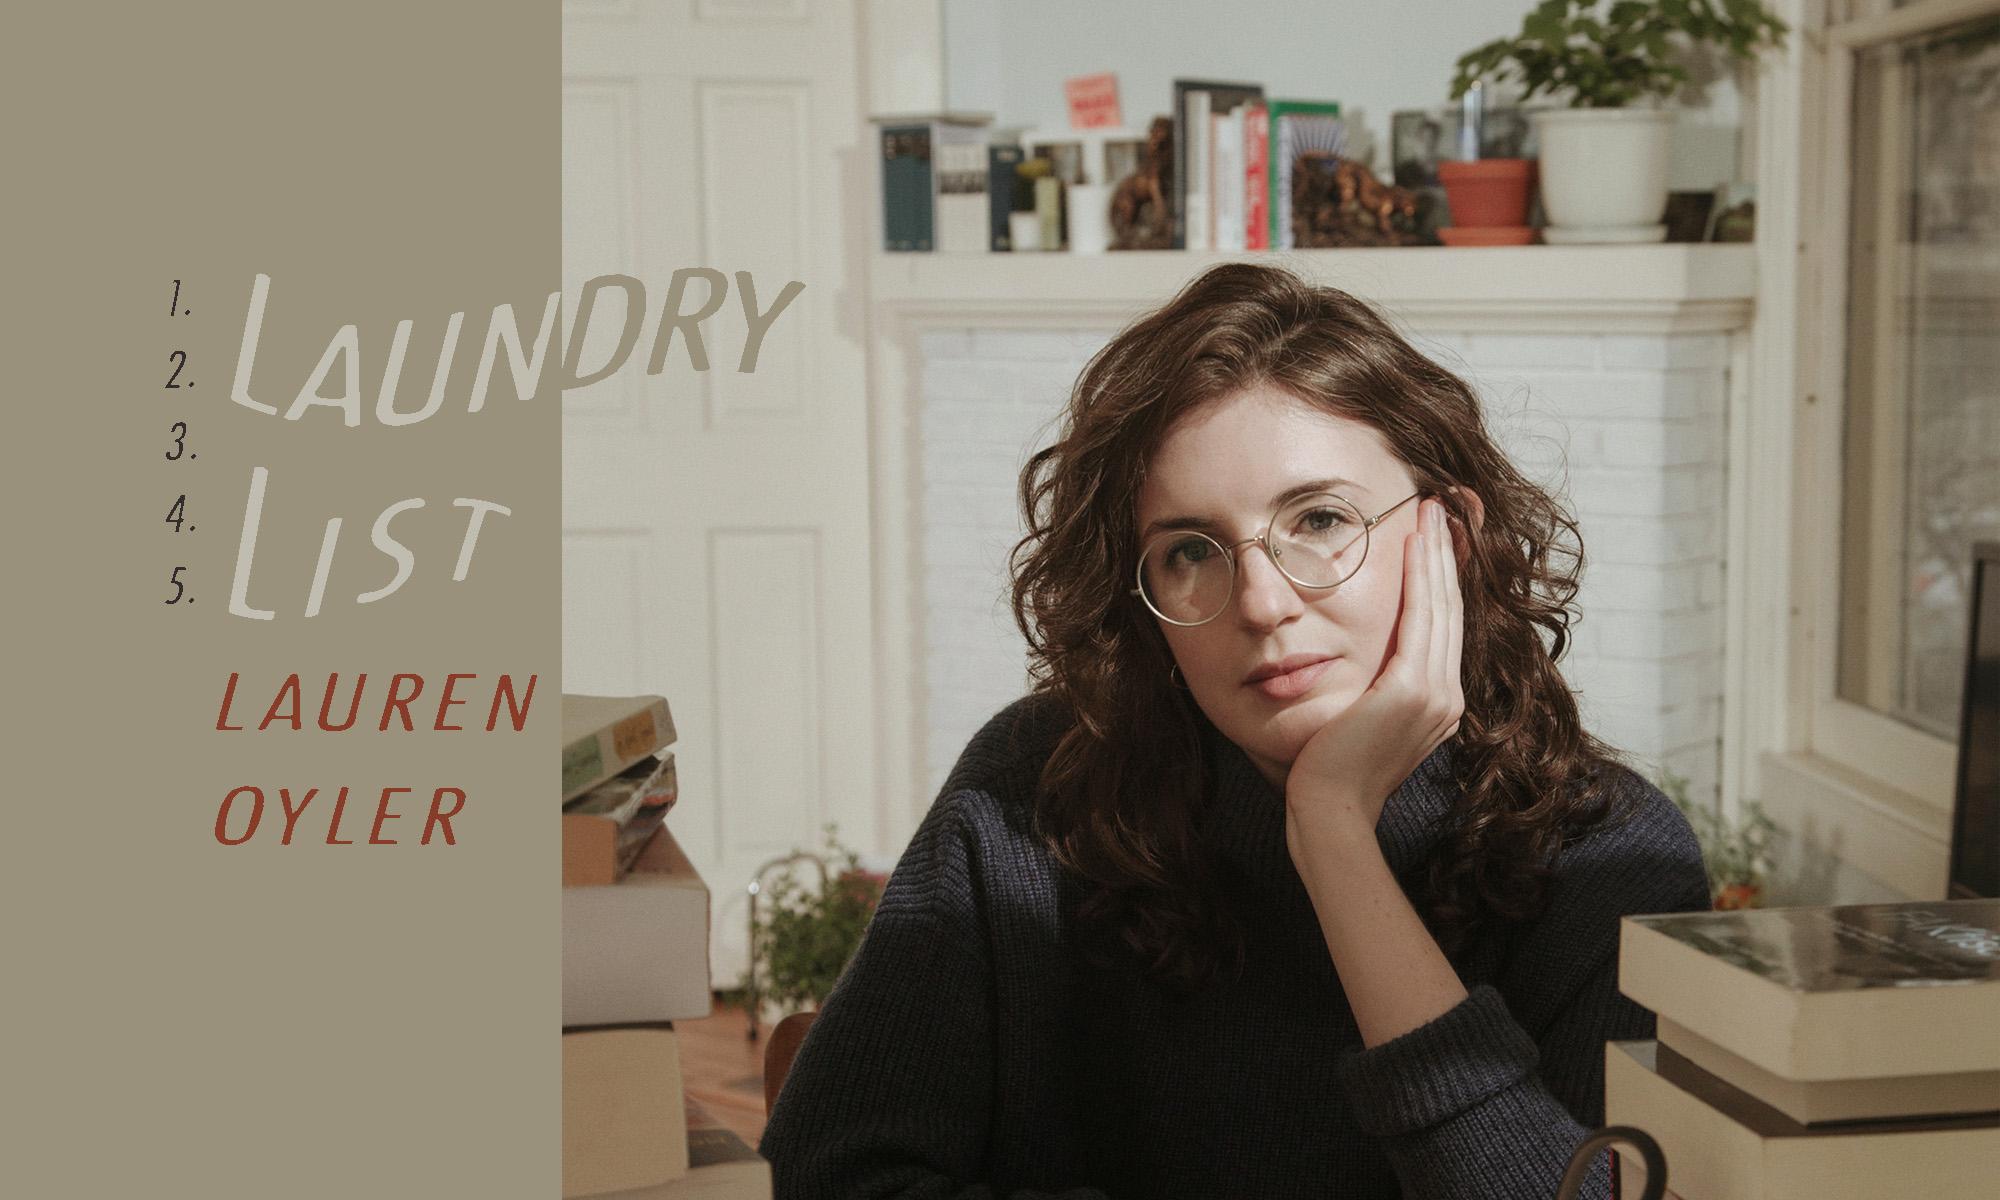 Laundry List: Lauren Oyler, Fake Accounts media hype - WILDCHILD SG